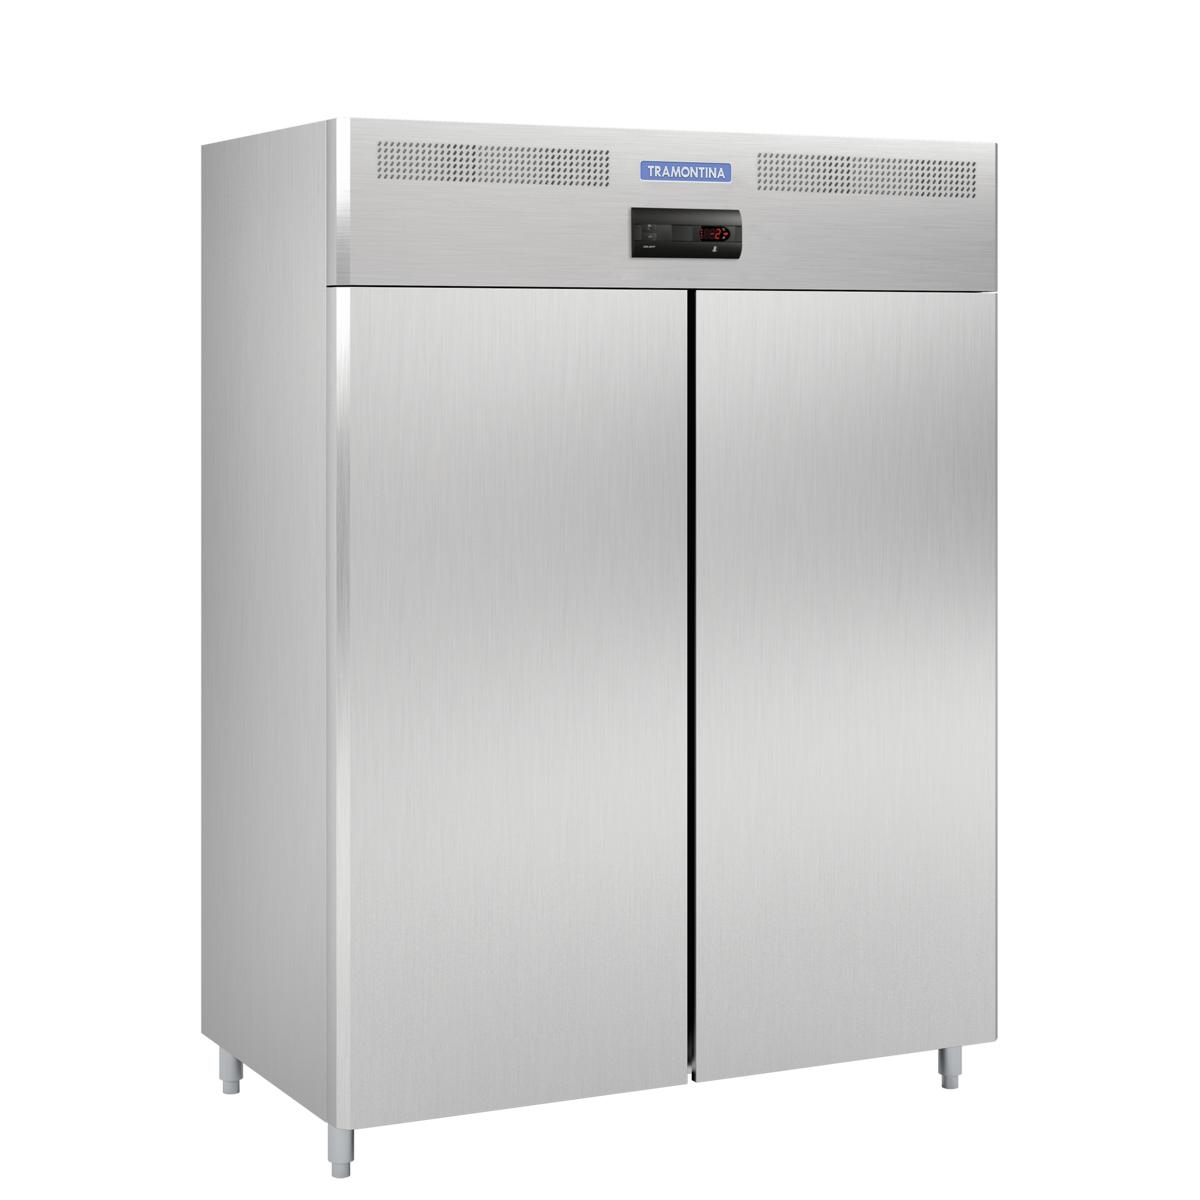 Professional refrigerator, 2 doors | Tramontina